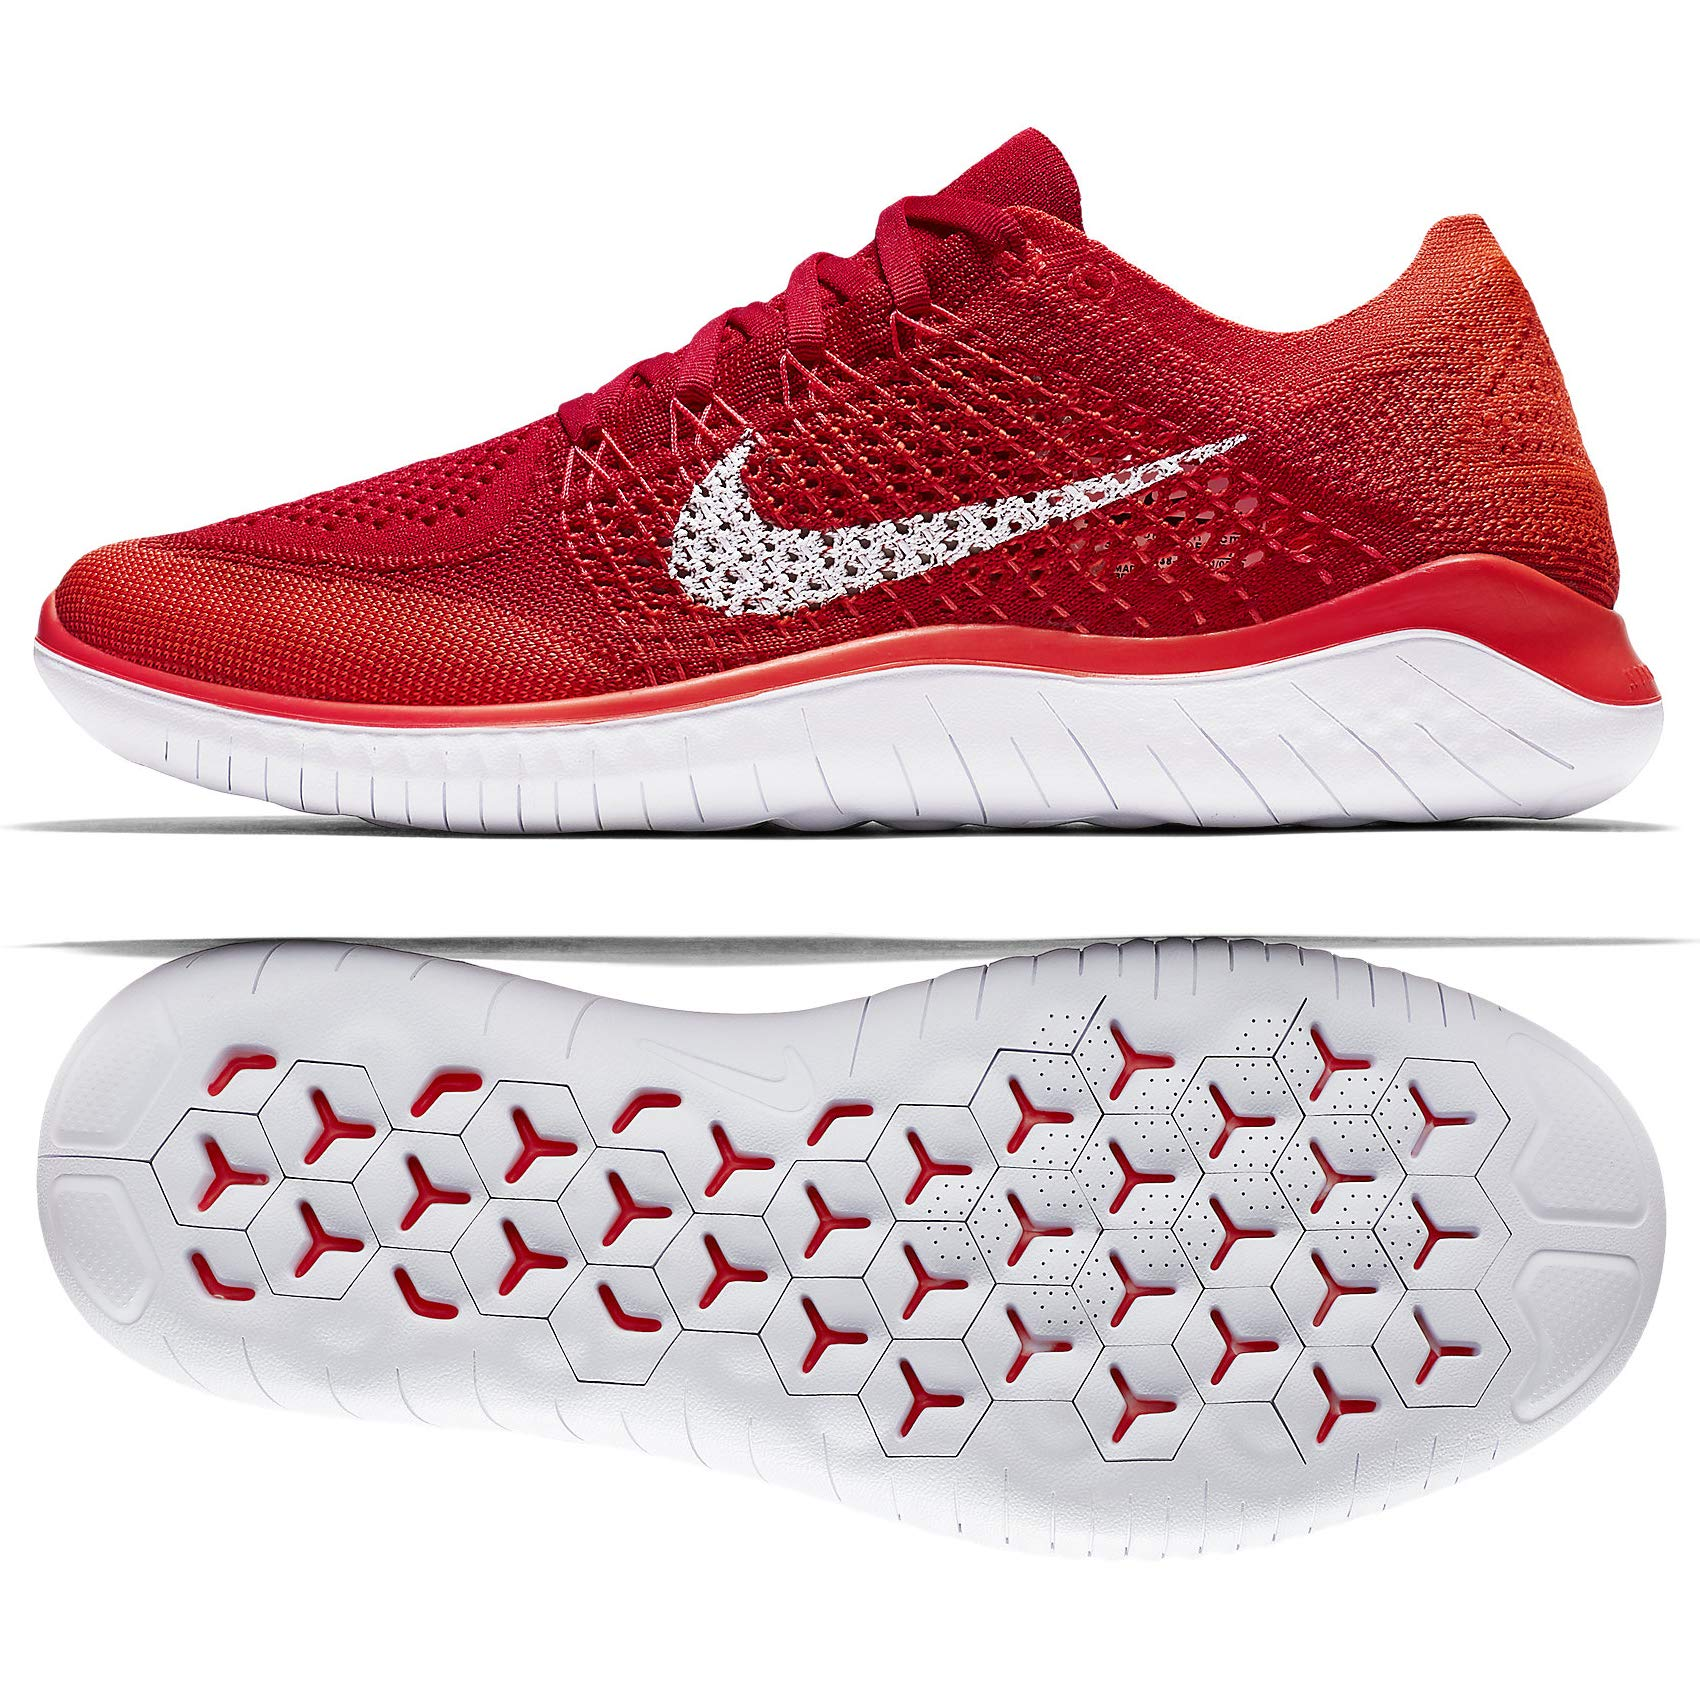 NIKE Men's Free RN Flyknit RunningTraining Shoes 11 D(M) US